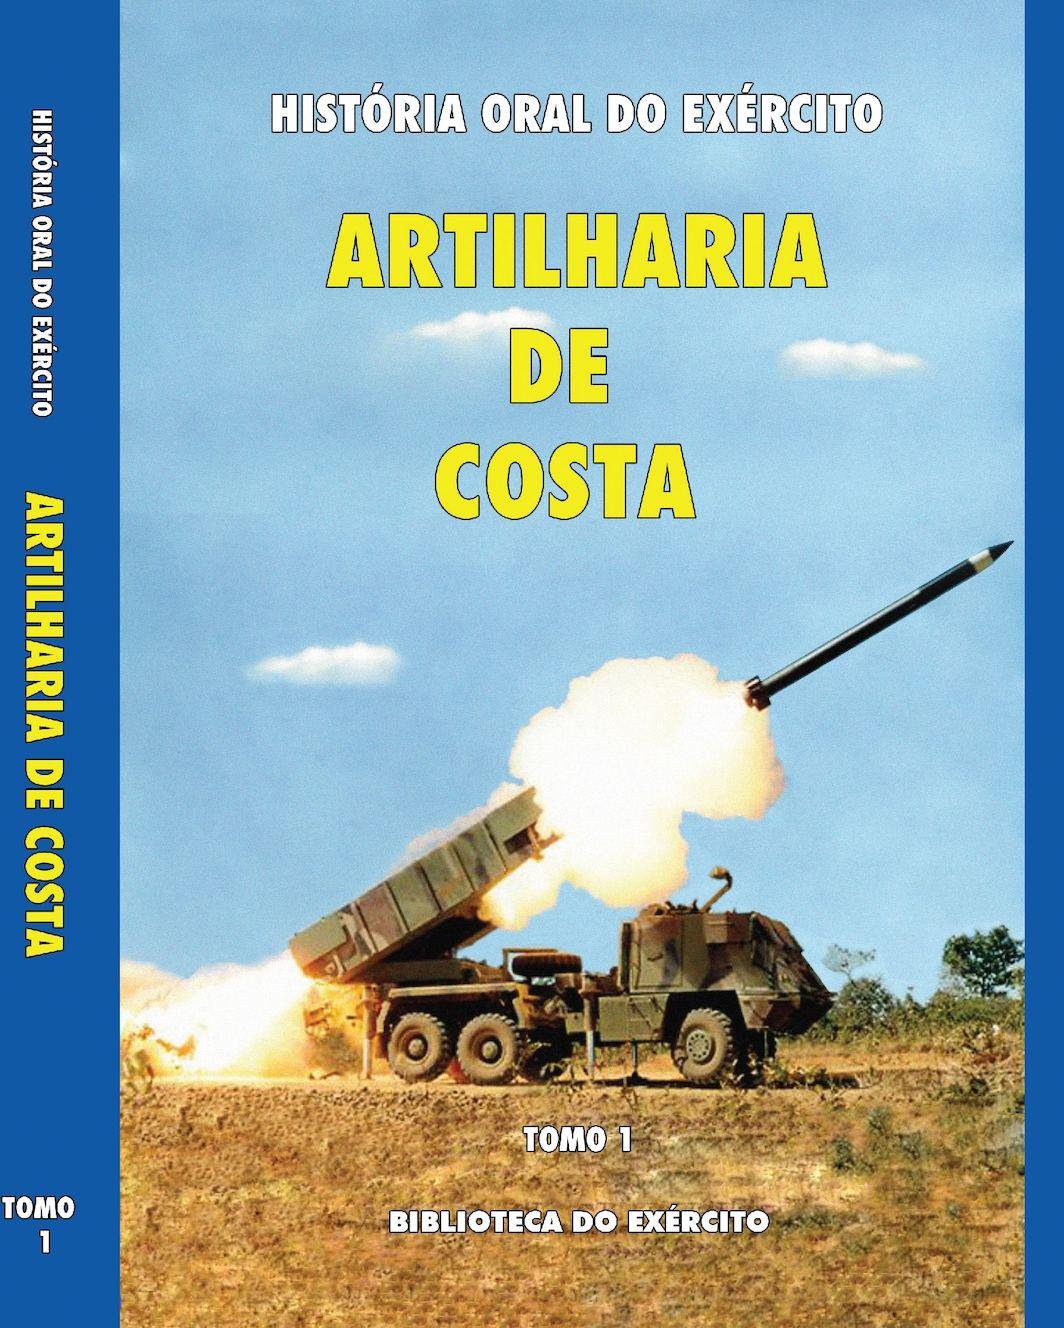 ee0fc94575 Calaméo - Artilharia de Costa